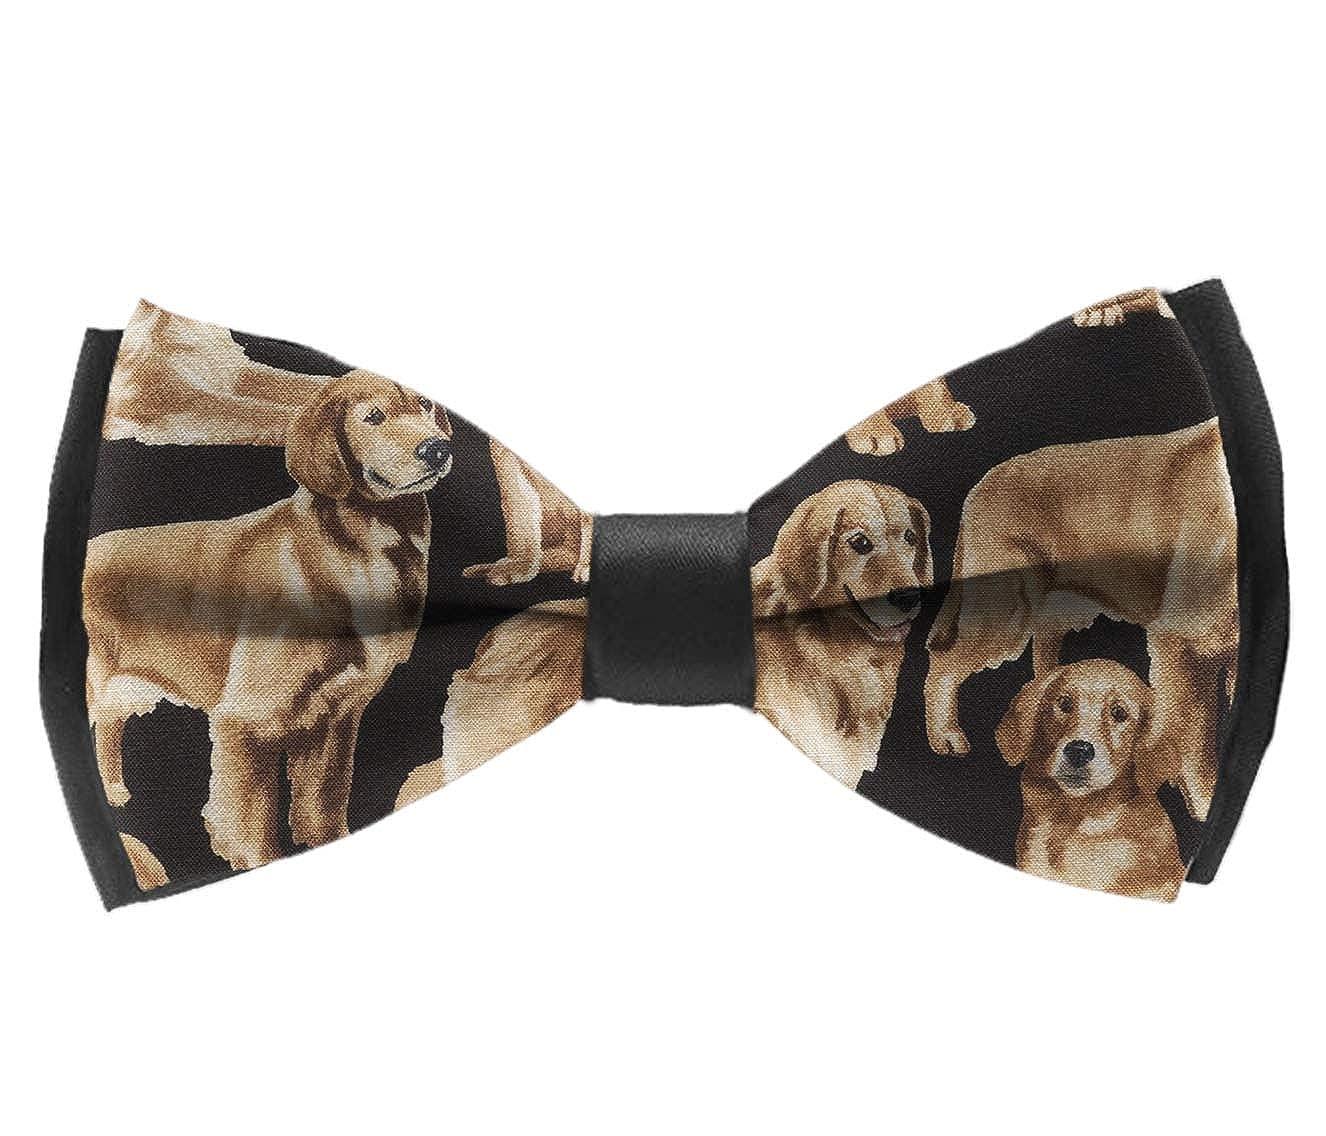 Bow Tie Golden Retrievers Adjustable Bowtie for Wedding Party